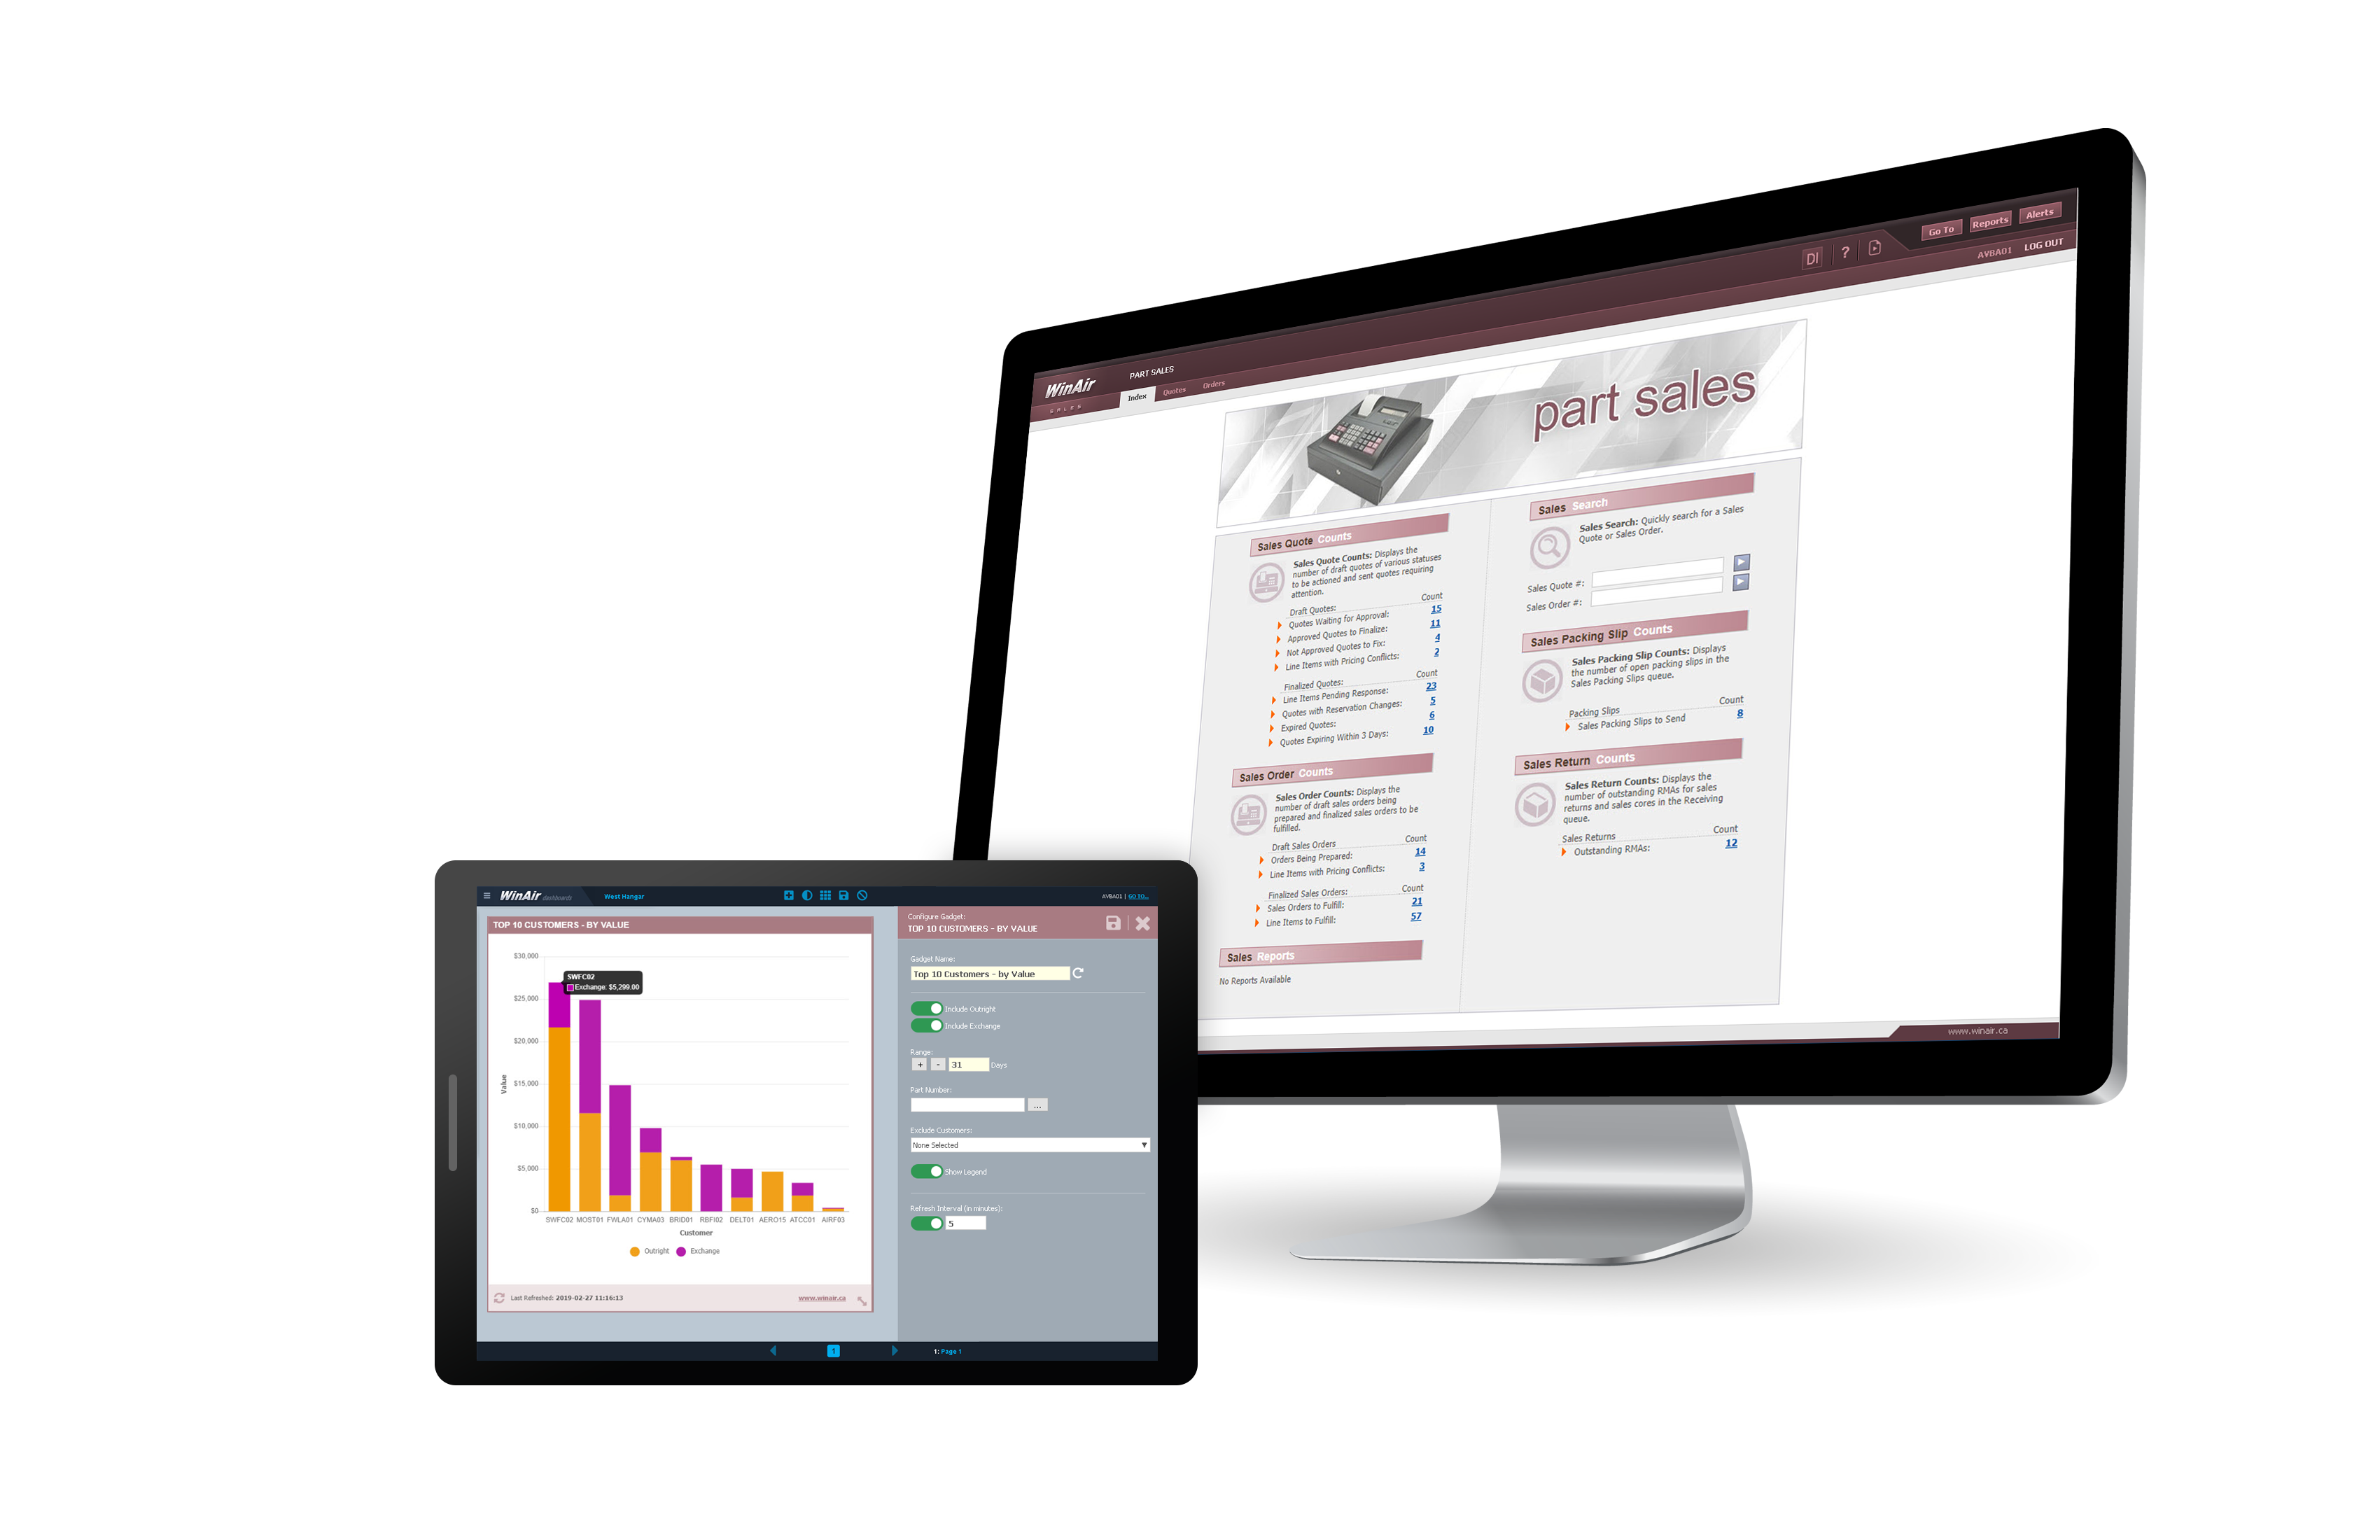 WinAir Part Sales Module for WinAir Version 7 on Desktop and Tablet